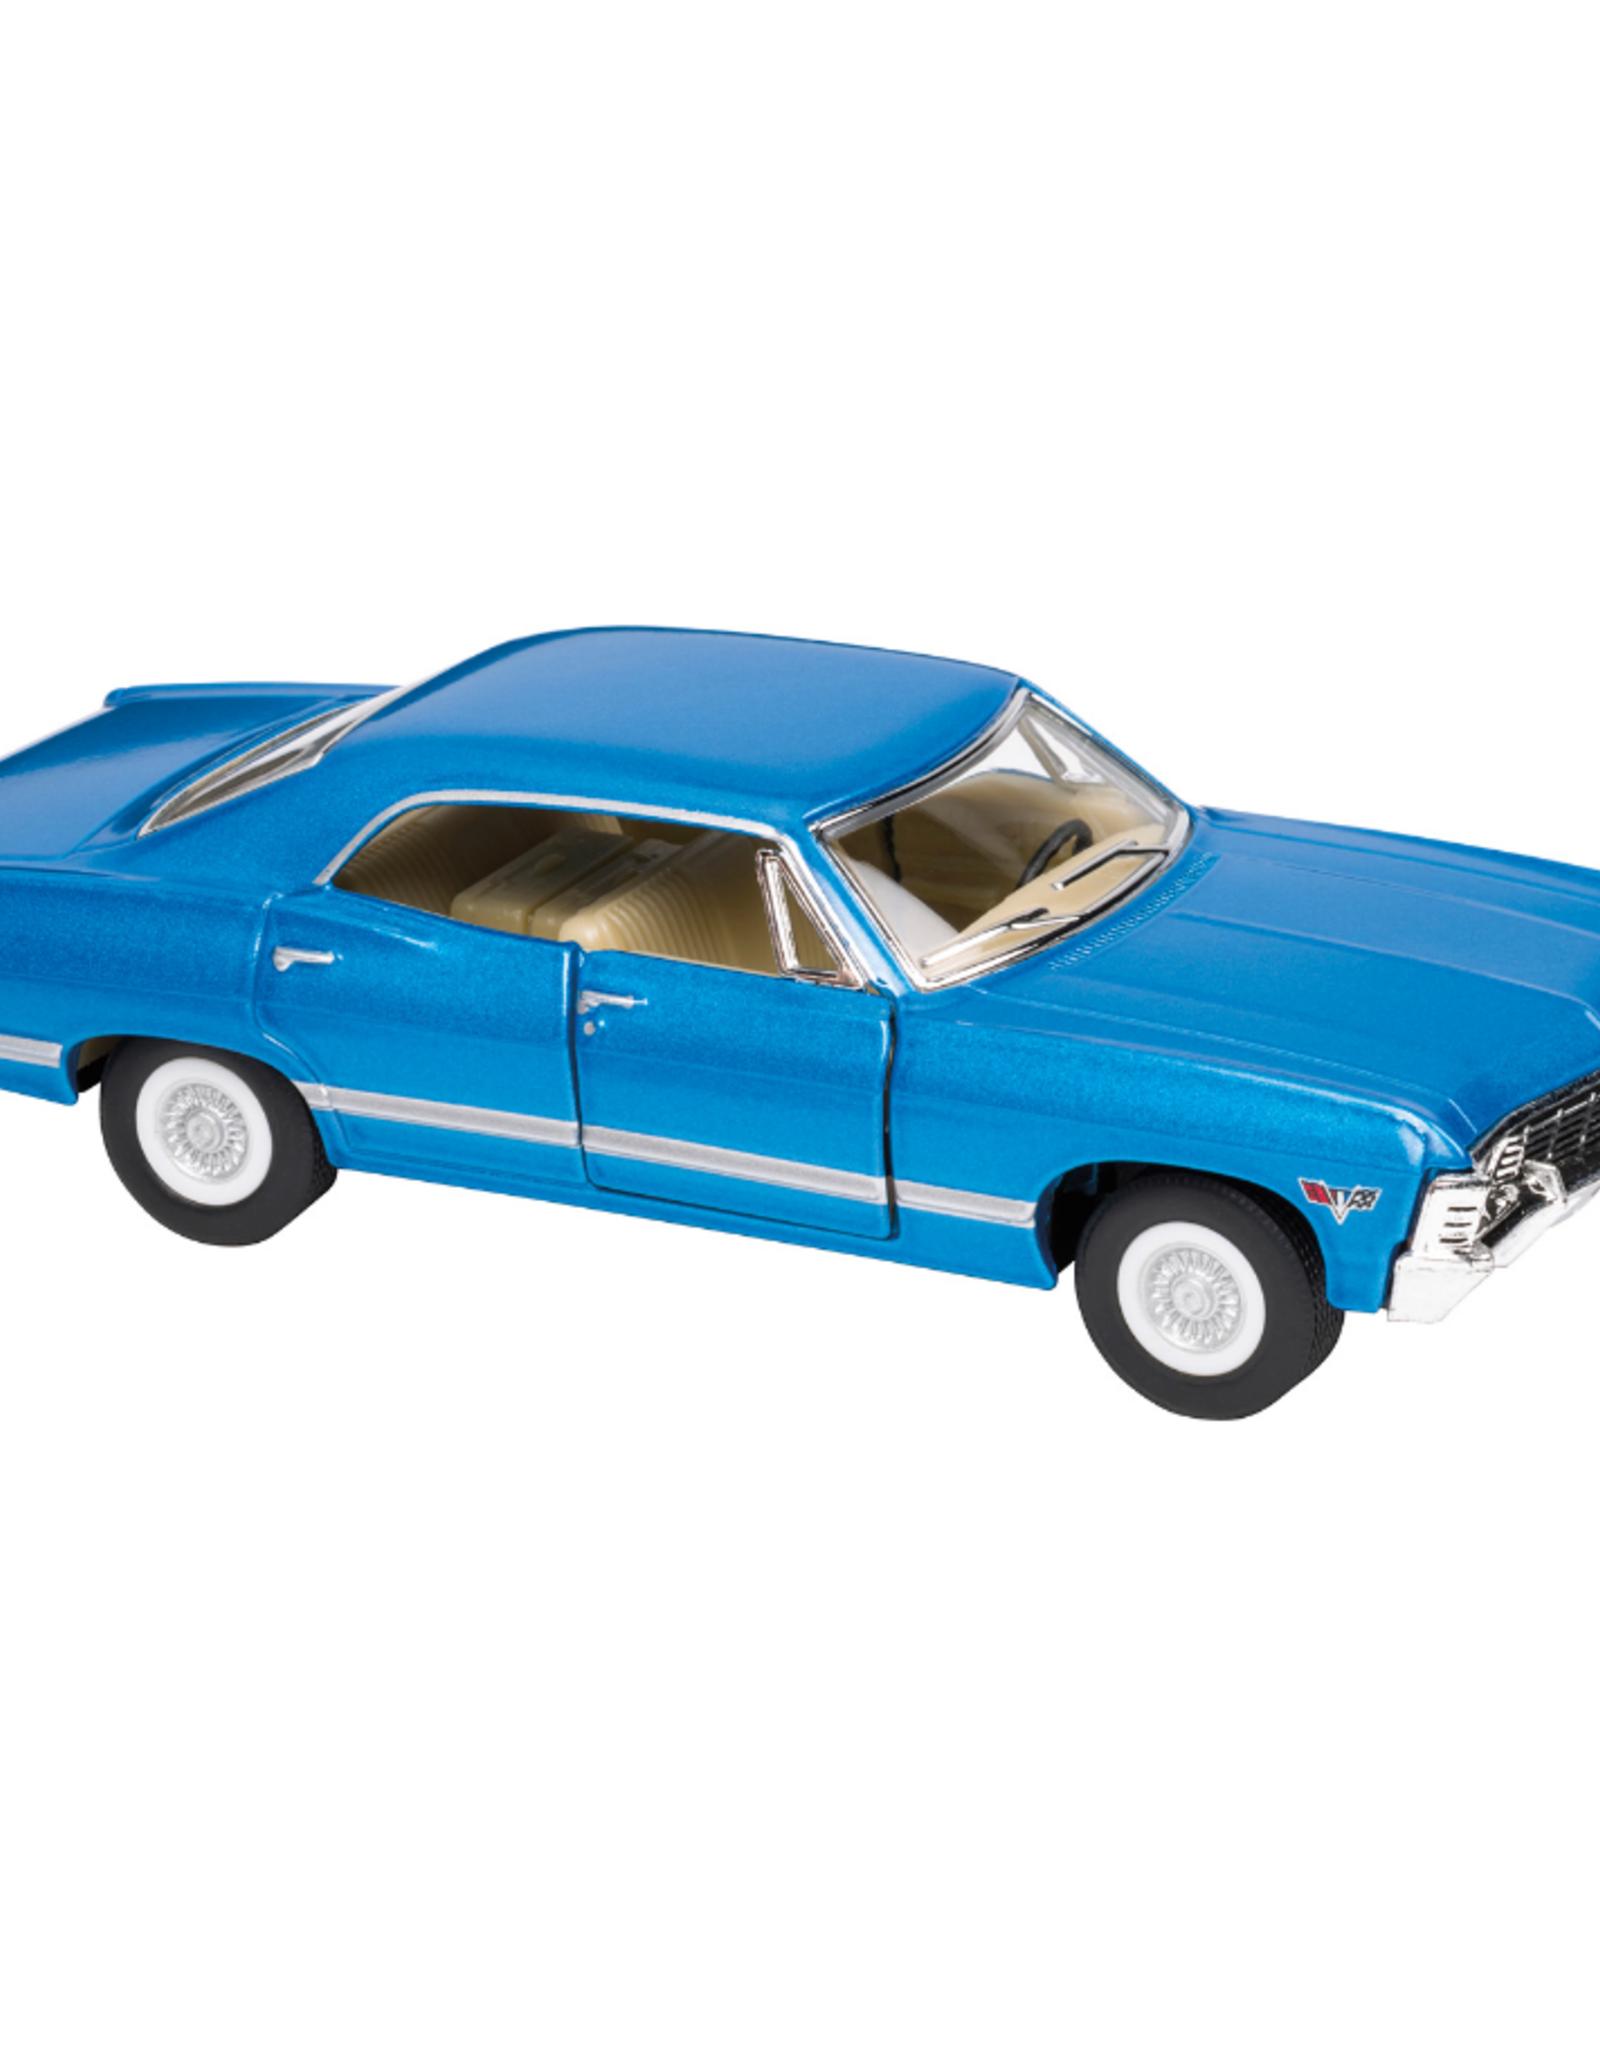 Chevy Impala Diecast